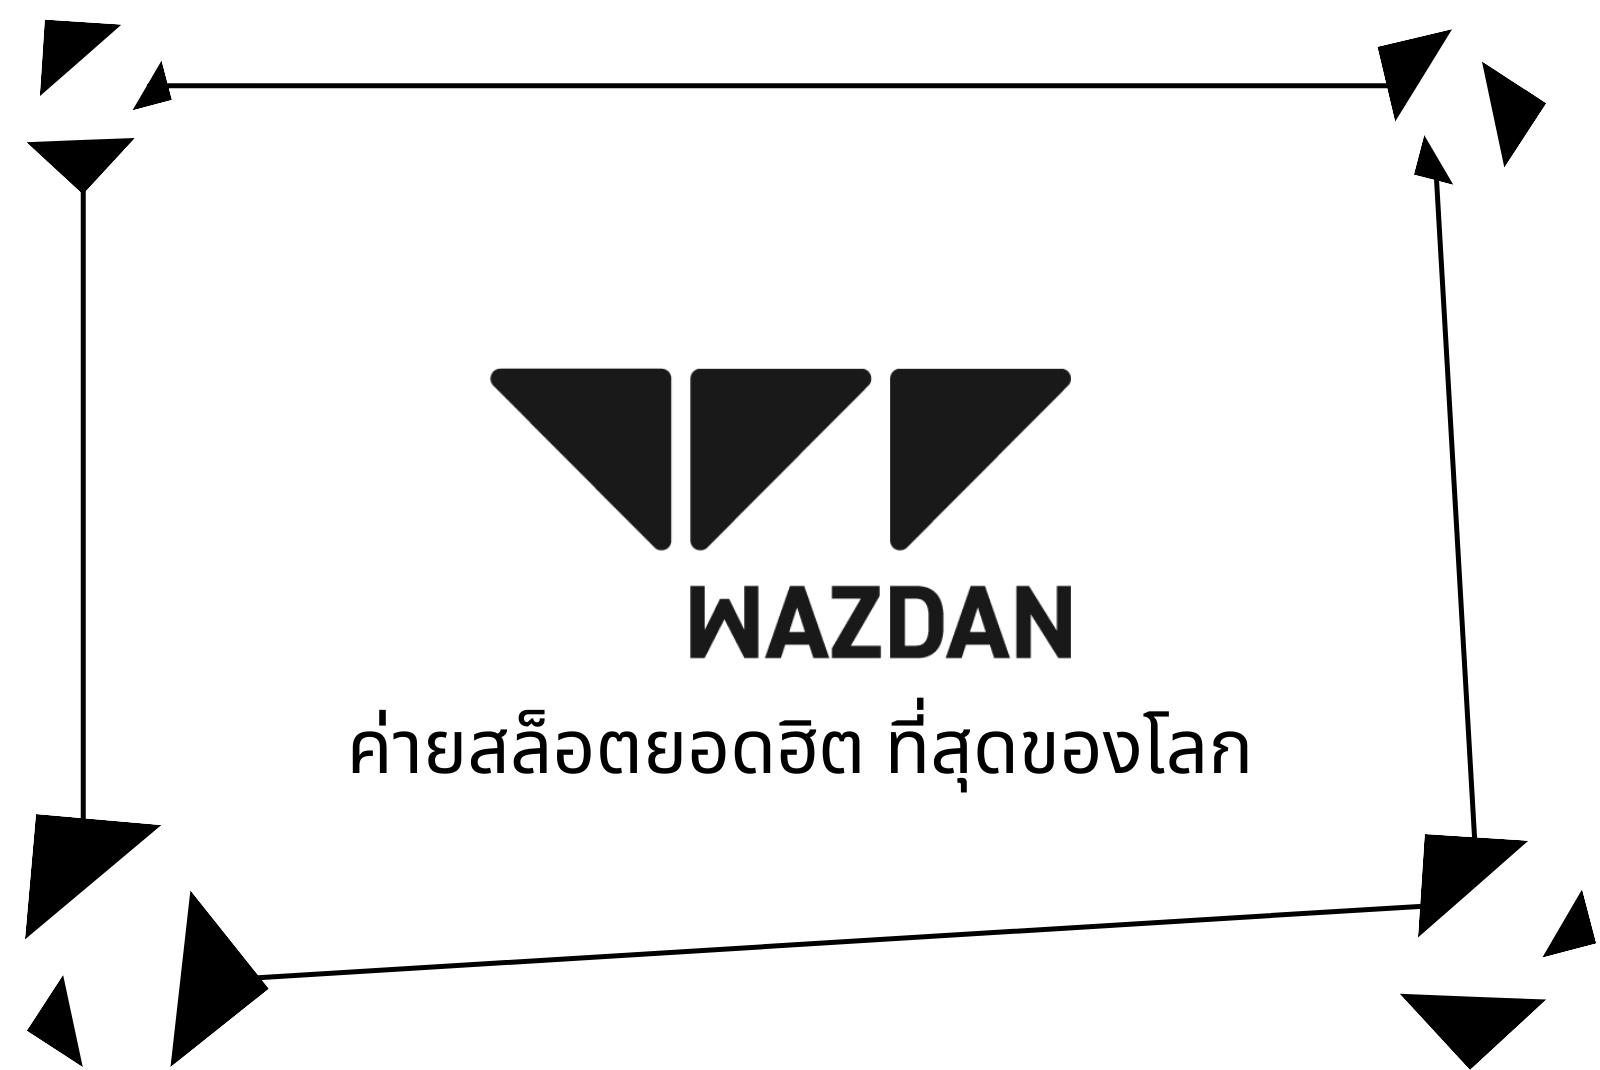 Wazdan ค่ายสล็อตยอดฮิต ที่สุดของโลก